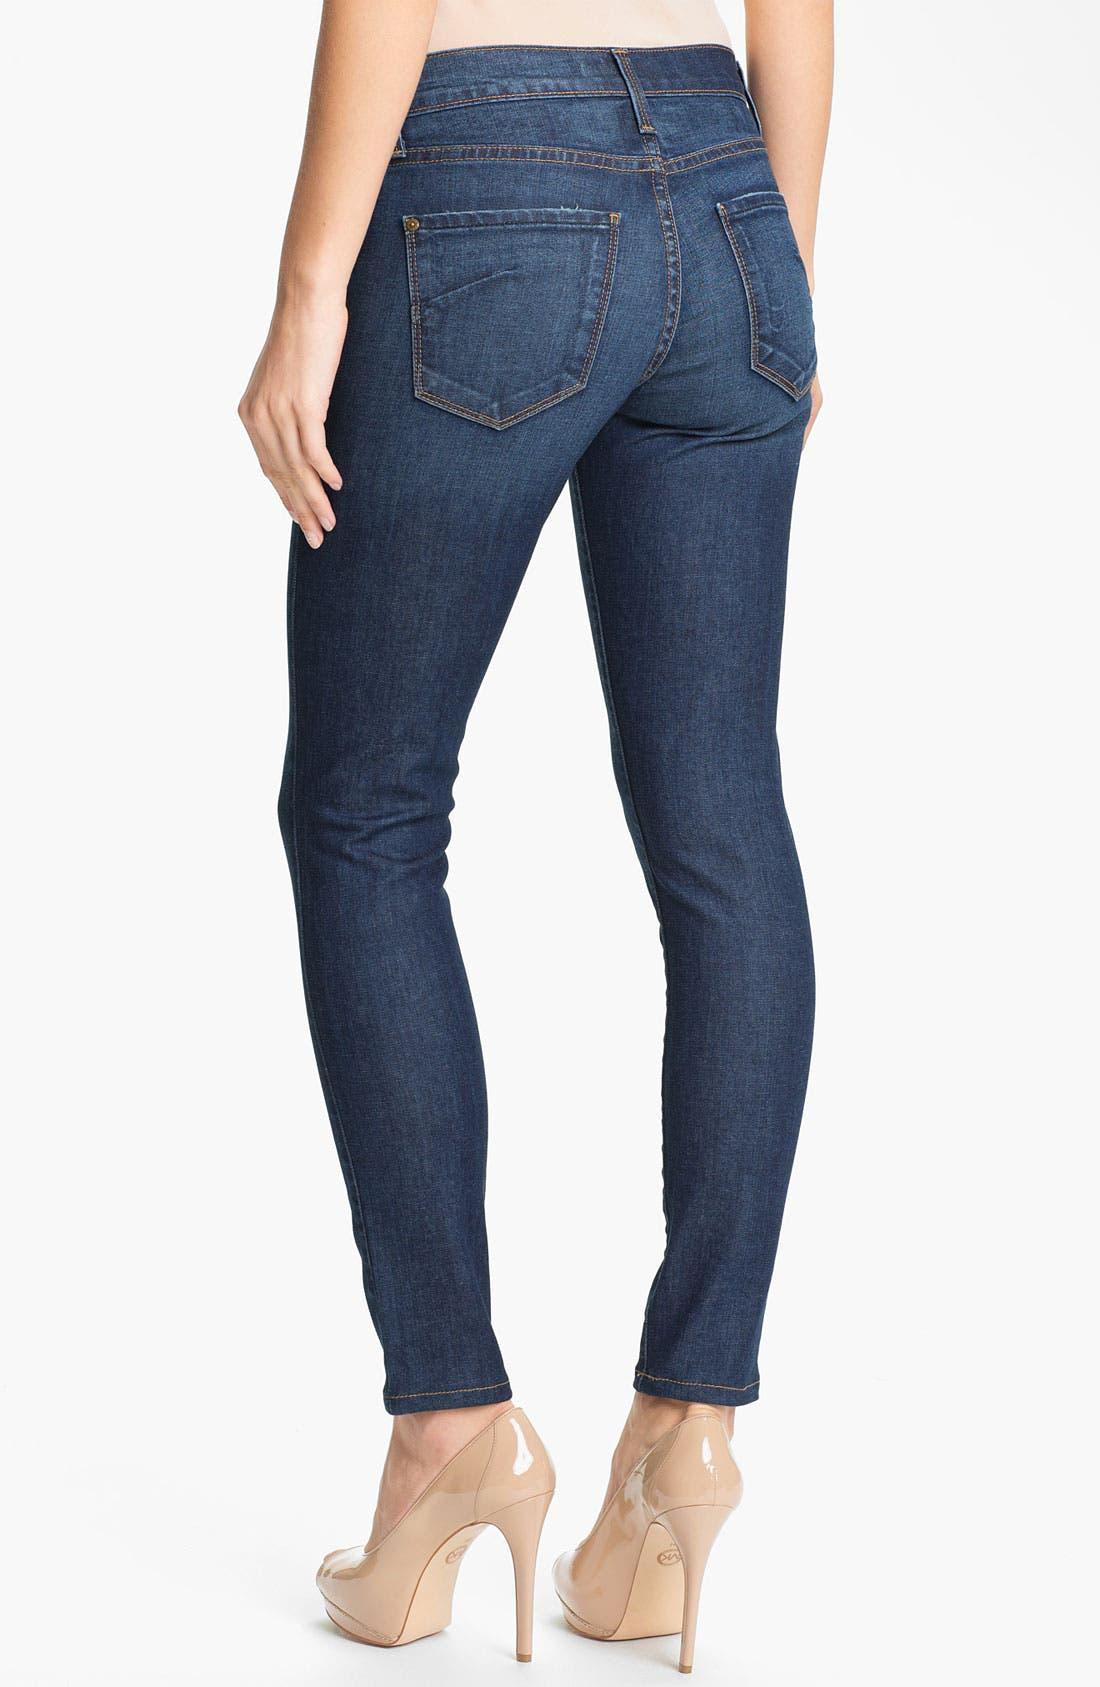 Alternate Image 2  - James Jeans Skinny Stretch Jeans (Havana) (Petite) (Online Only)